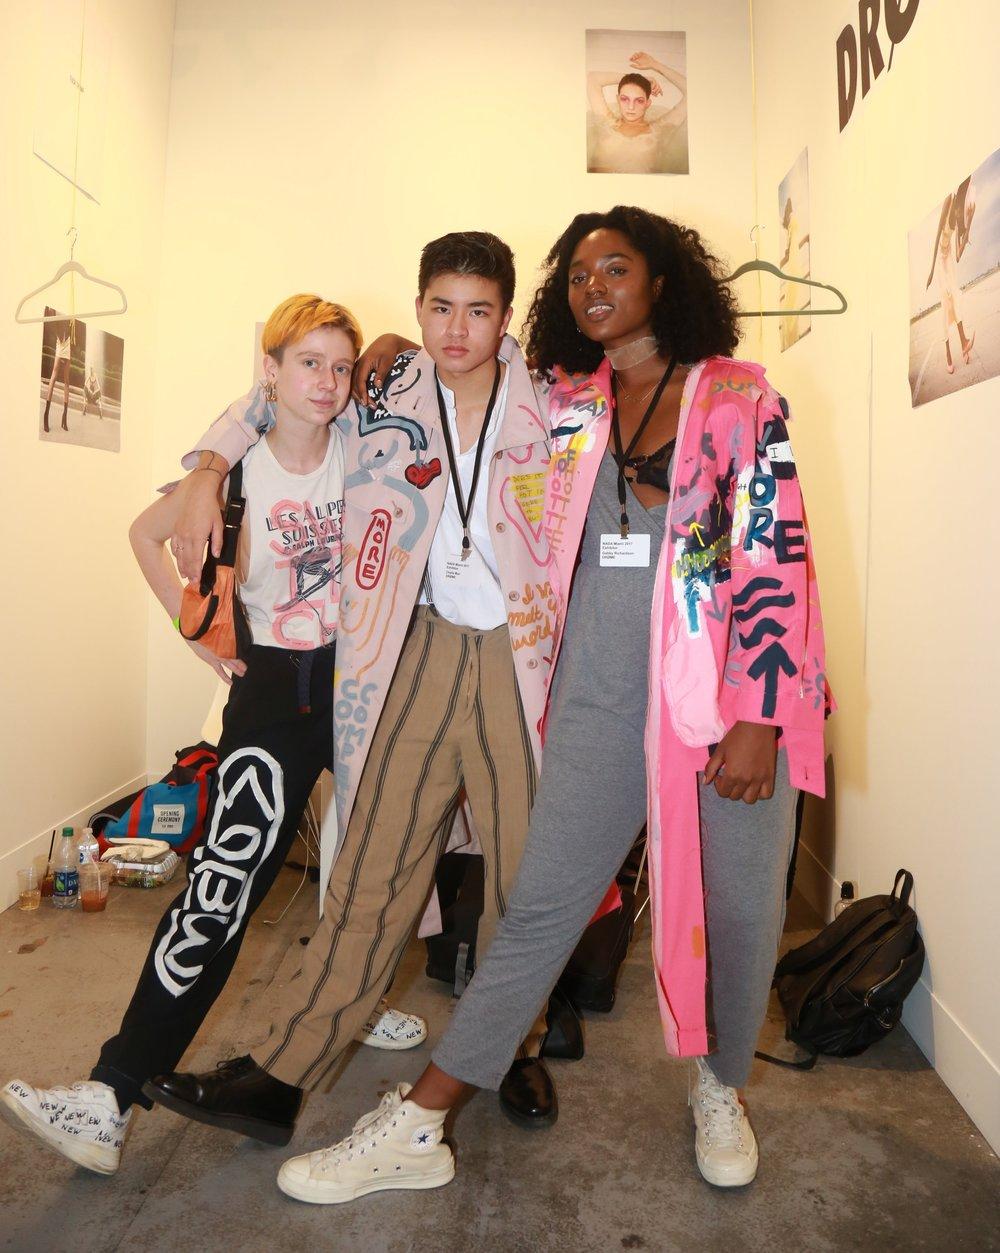 MI Leggett with Chella Man &Gabby Richardson at DRØME booth